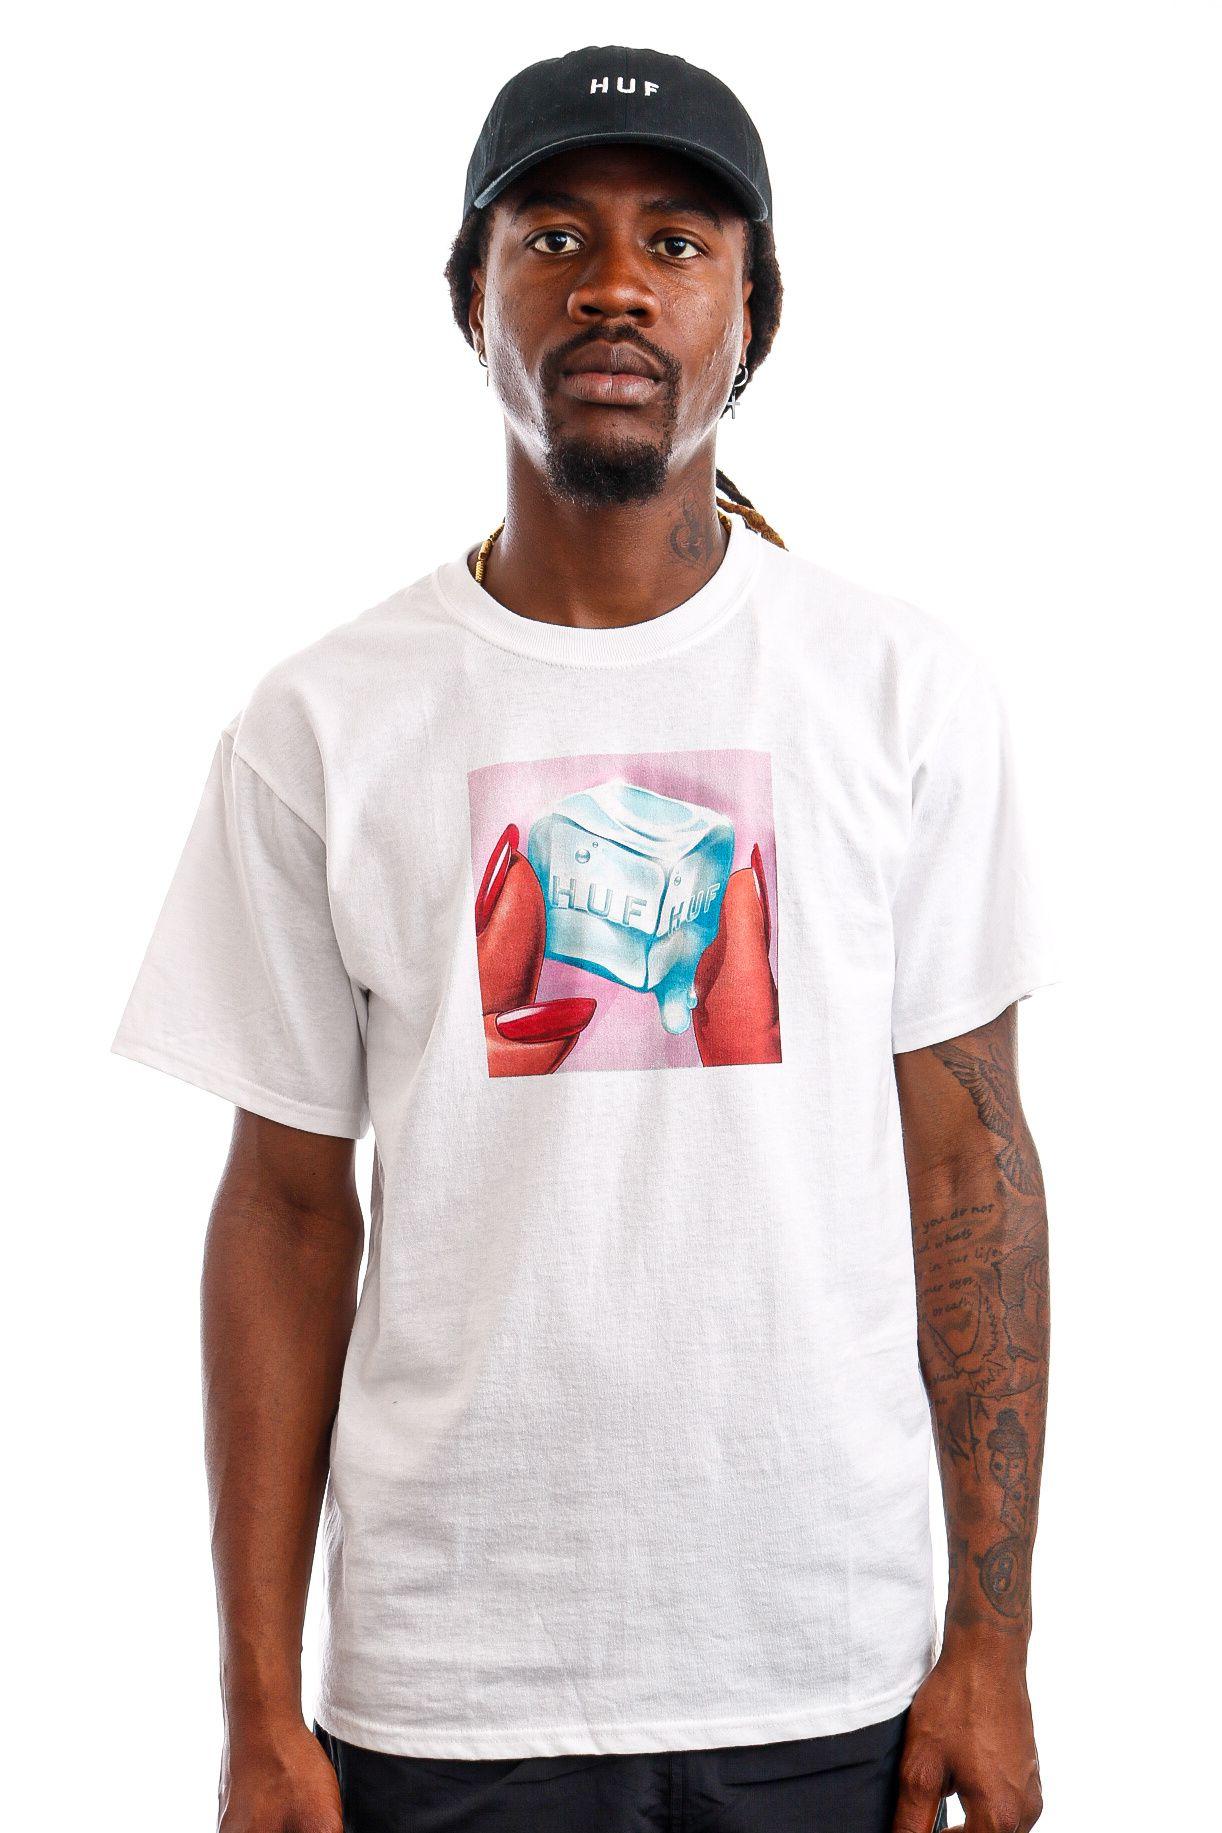 Afbeelding van HUF T-Shirt HUF ICE MELTS White TS01415